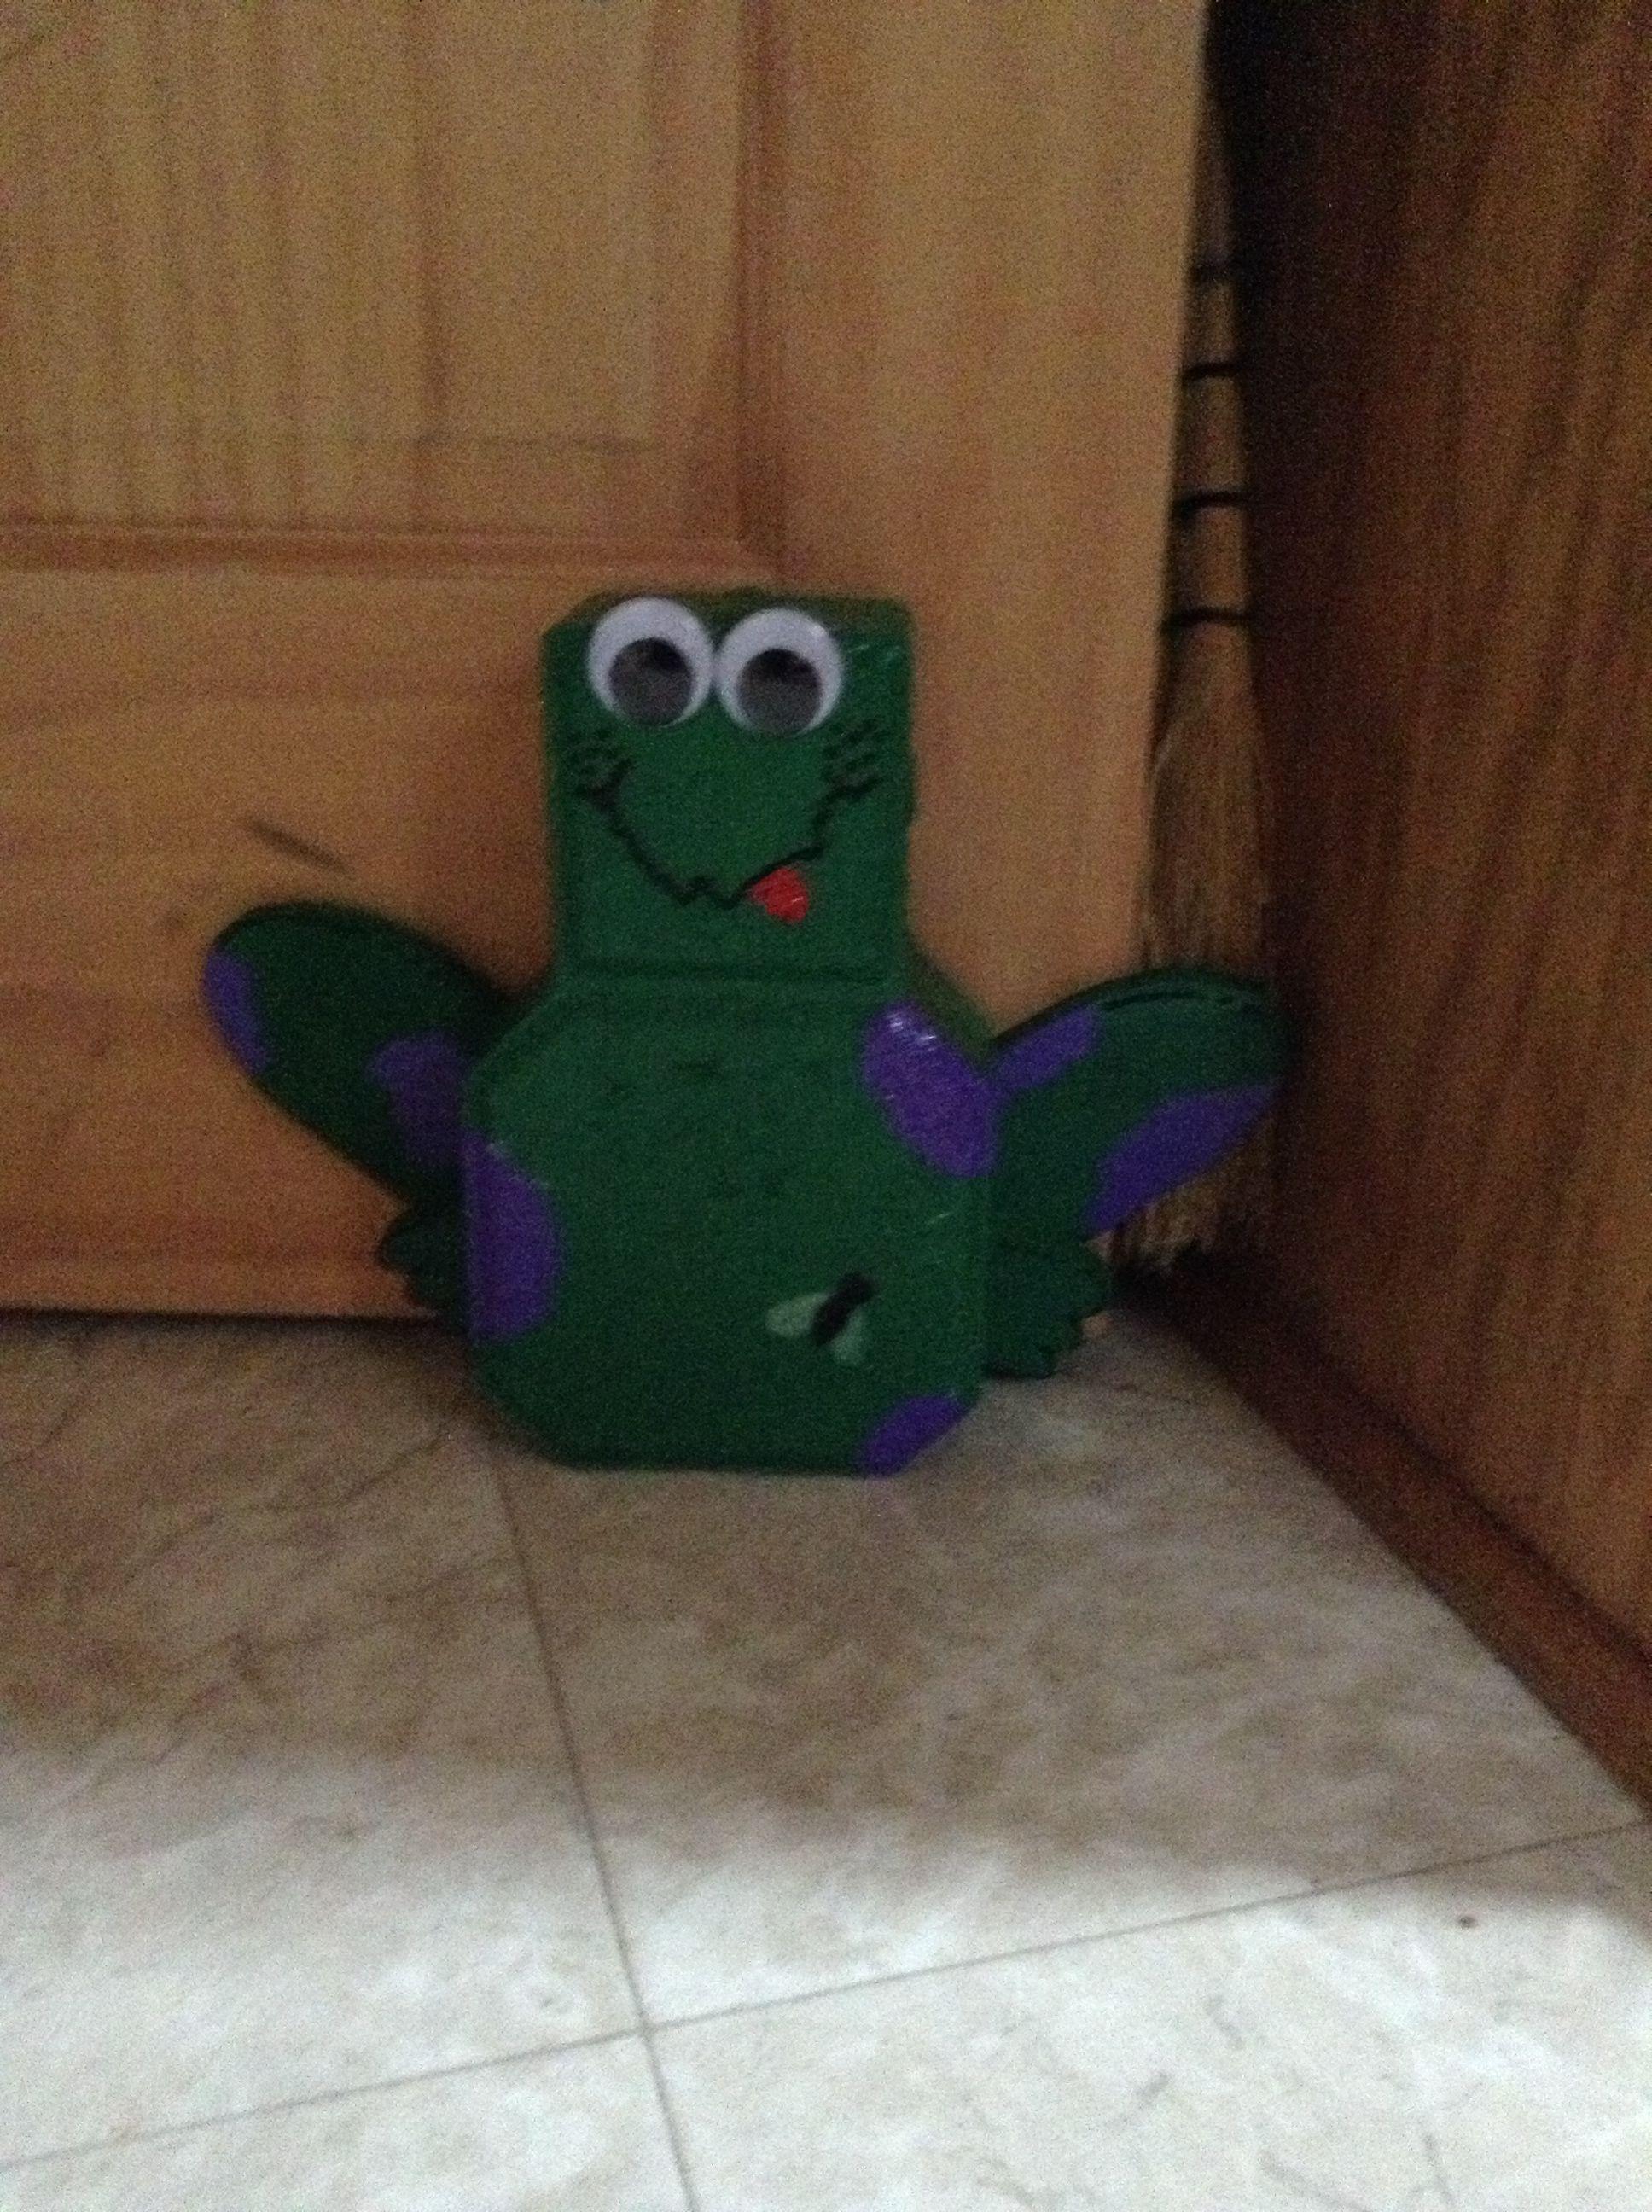 Frog door stopper from a landscaping block